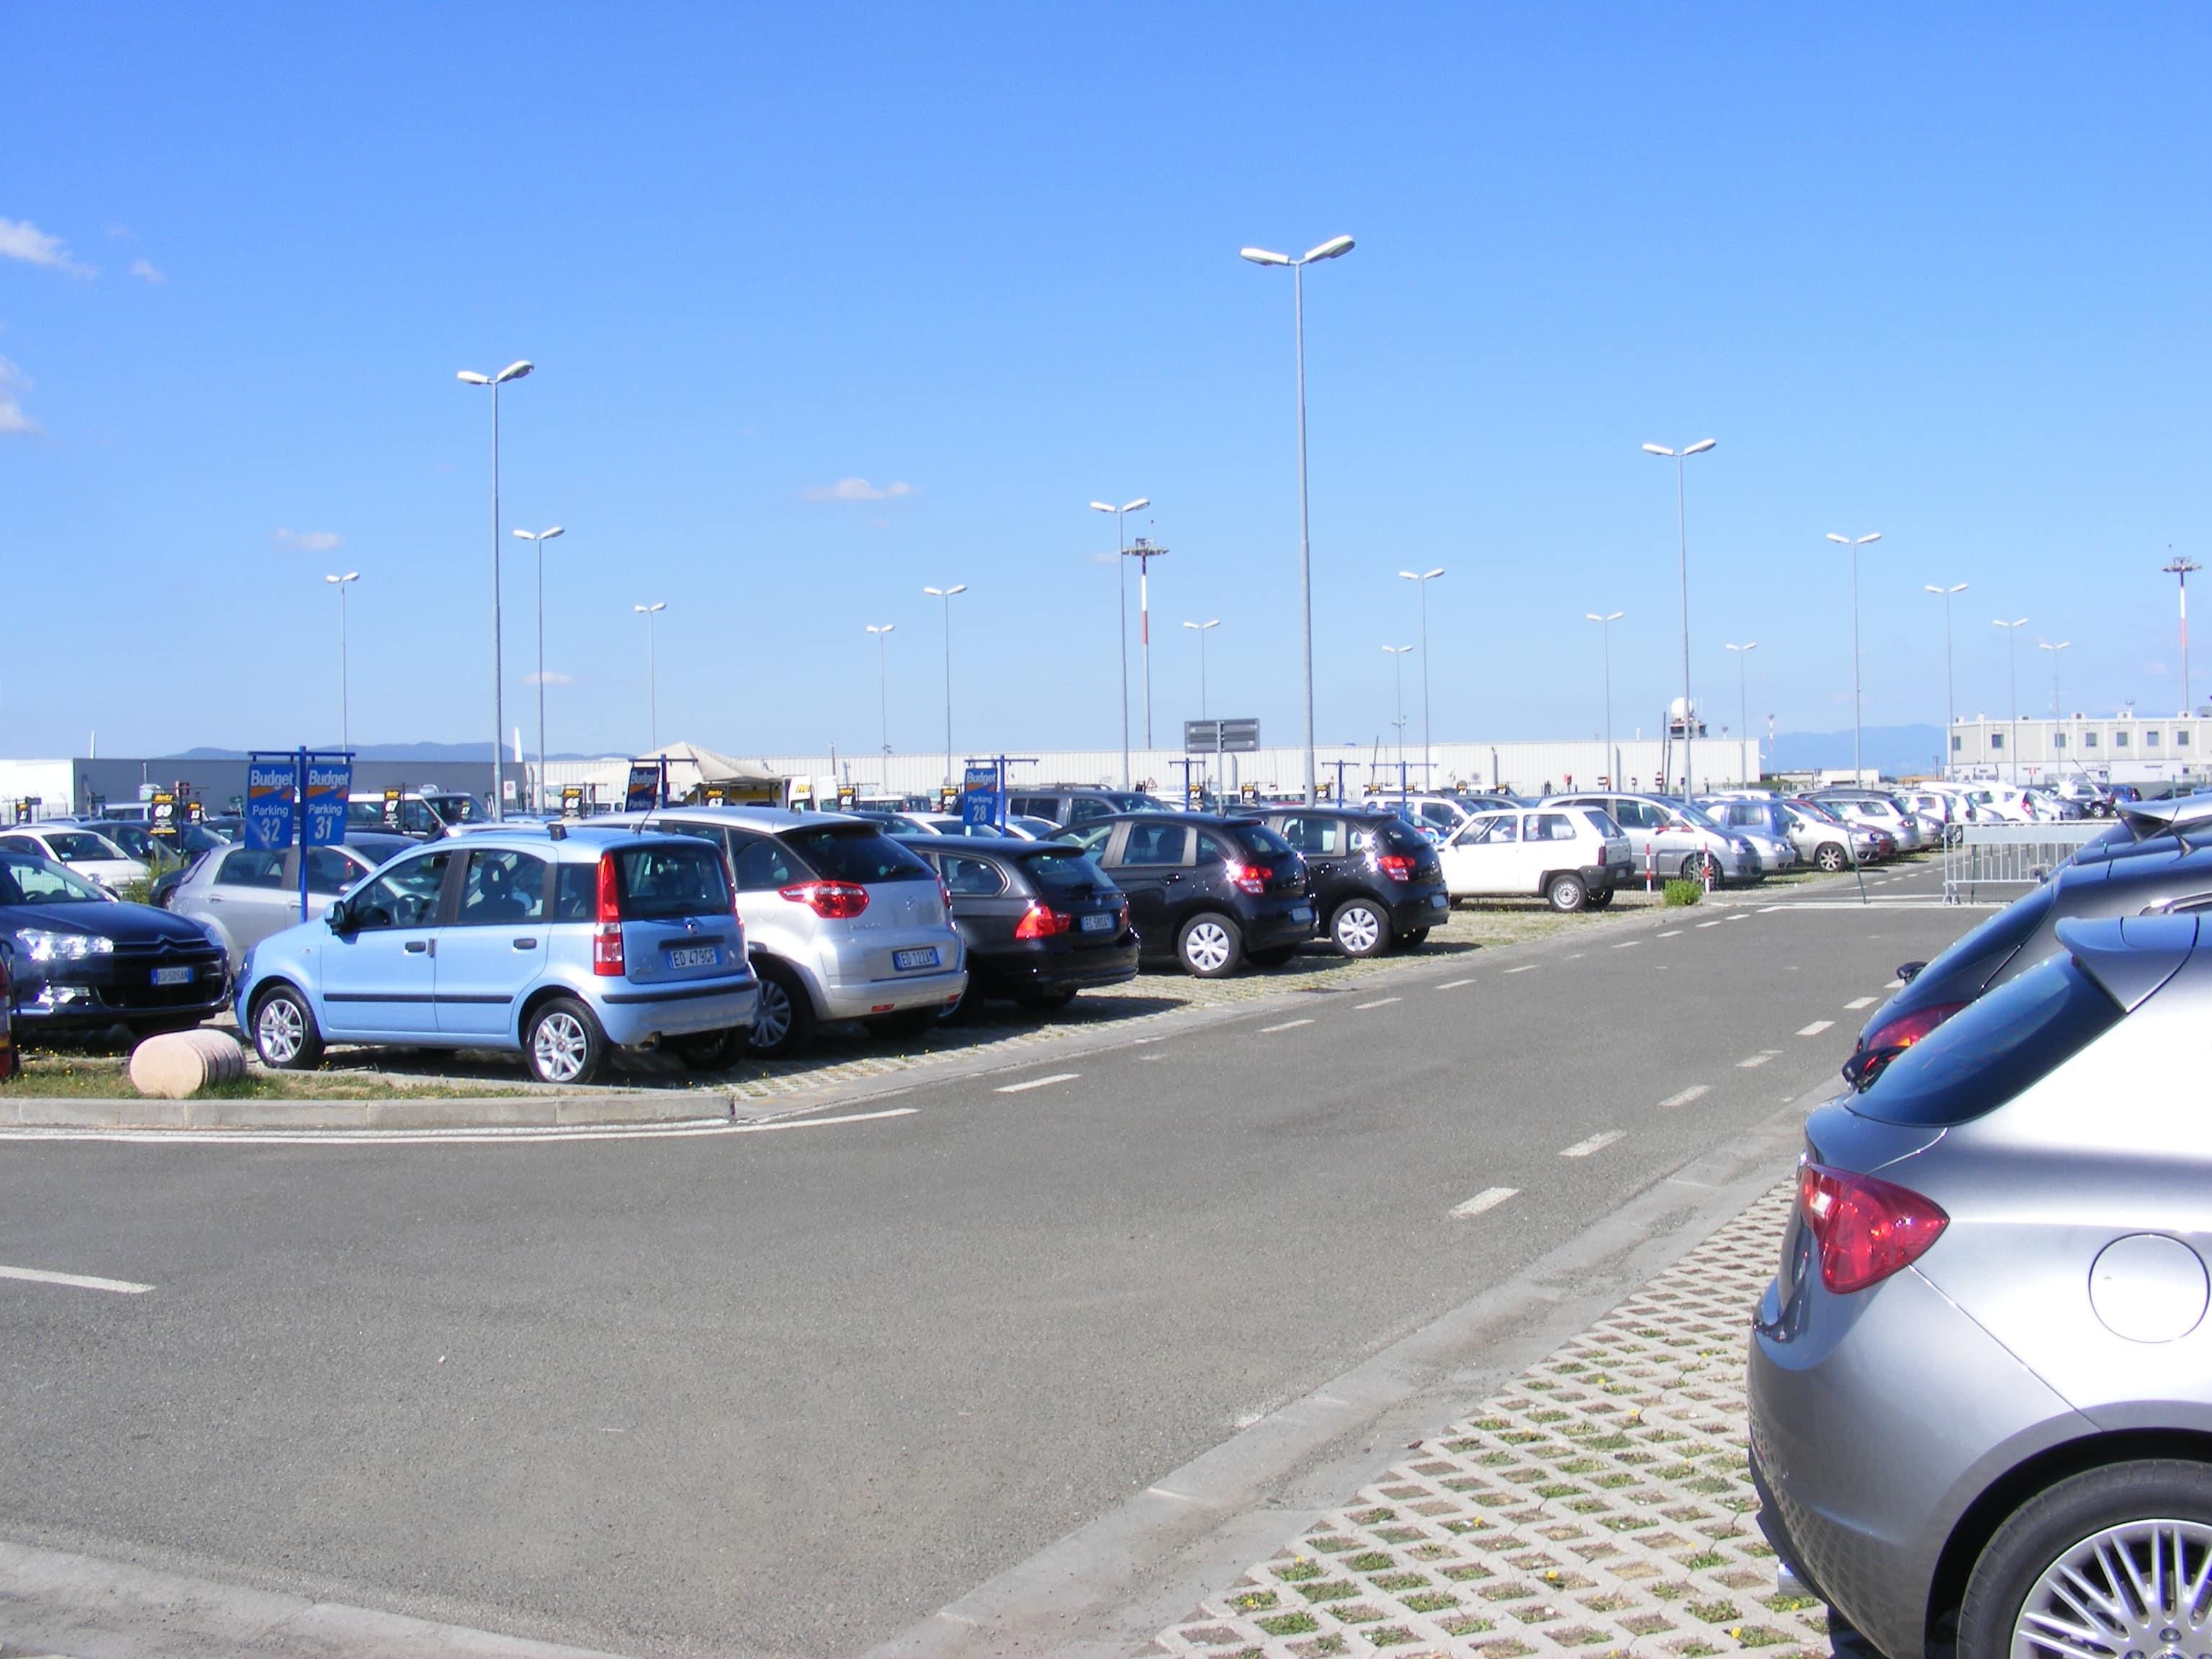 aeroporto_di_firenze_-_parking_lot_for_rental_cars